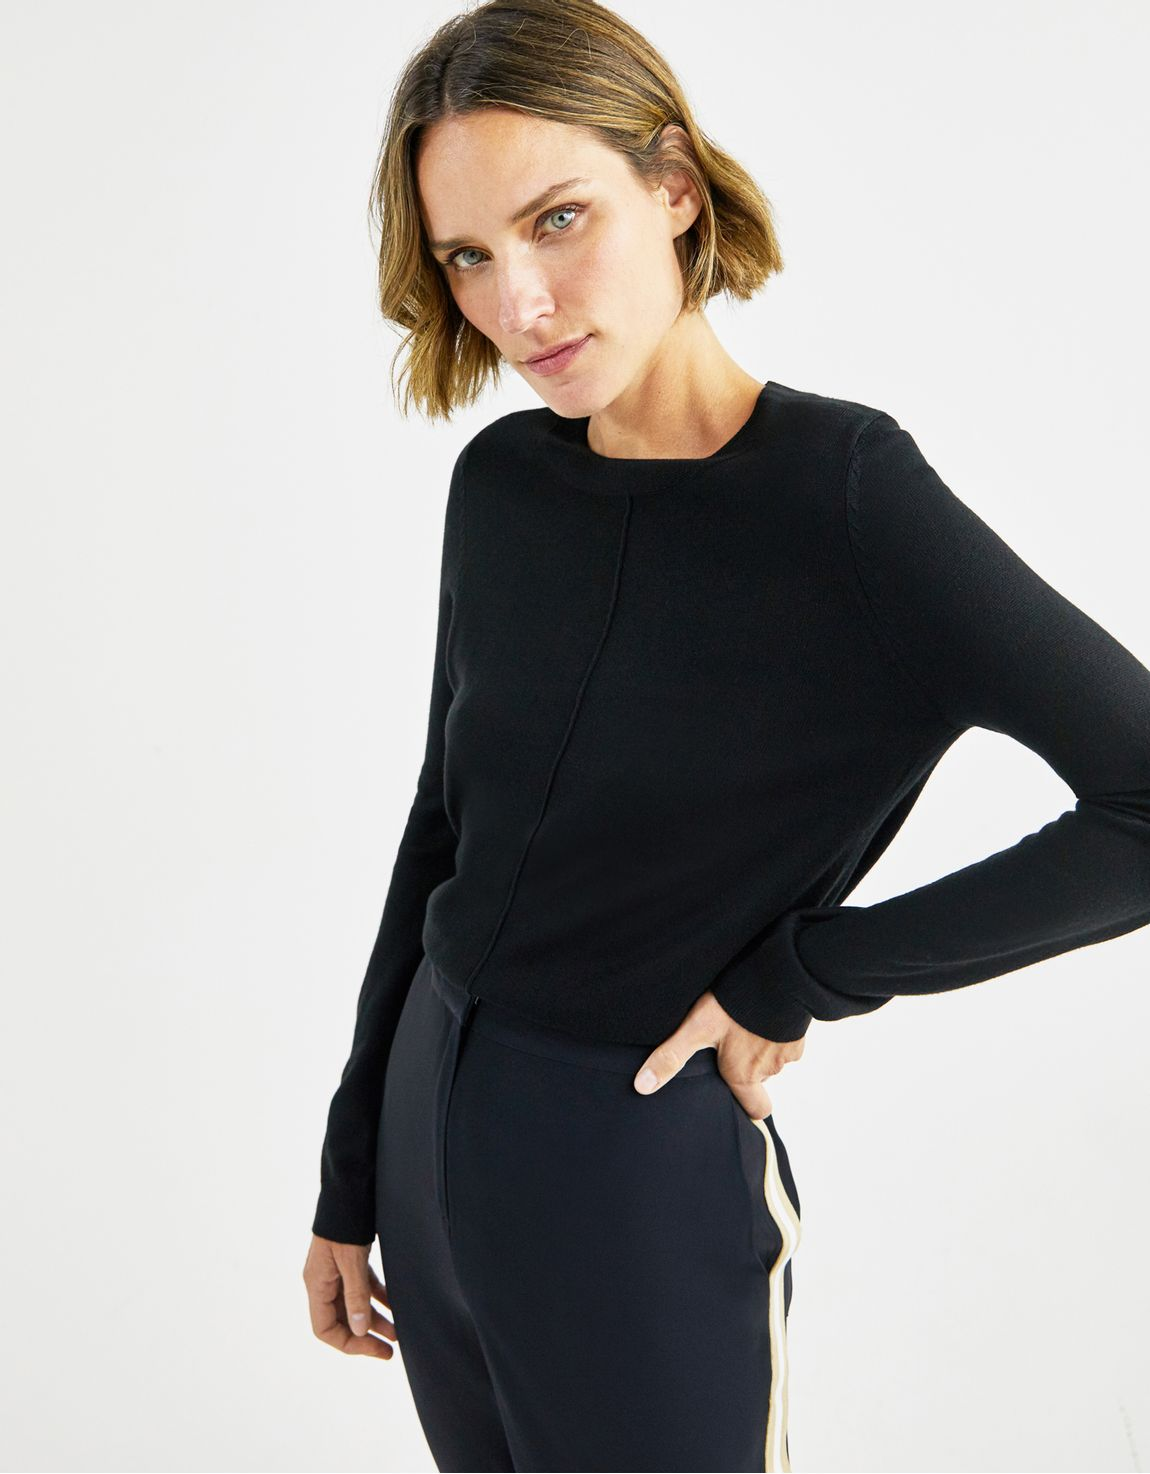 Blusa tricot basico decote redondo